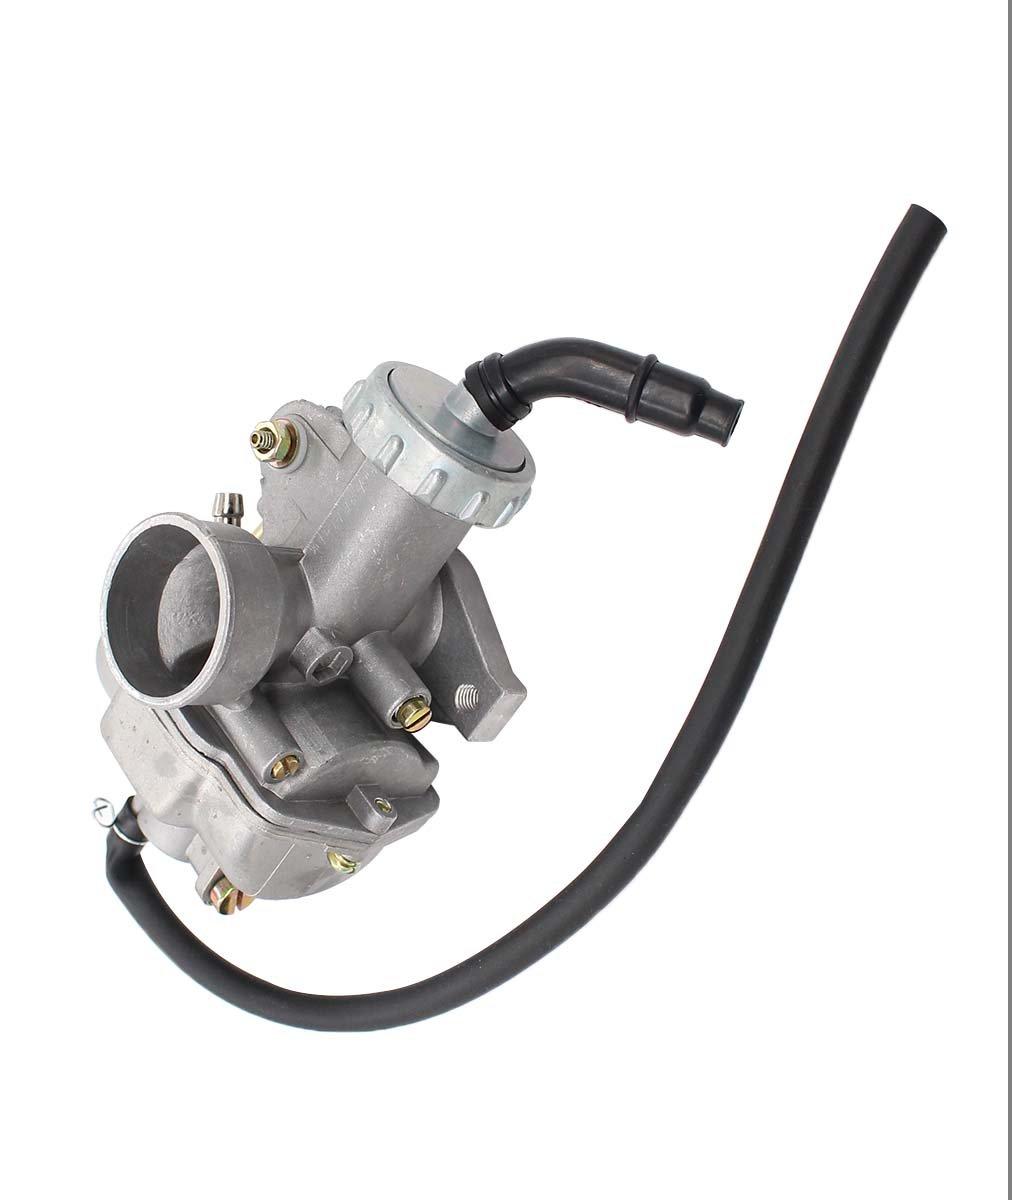 Pz20 Carburetor Air Fuel Filter For Taotao 110b Nst 4 Wheeler Sunl Kazuma Baja 50cc 70cc 90cc 110cc